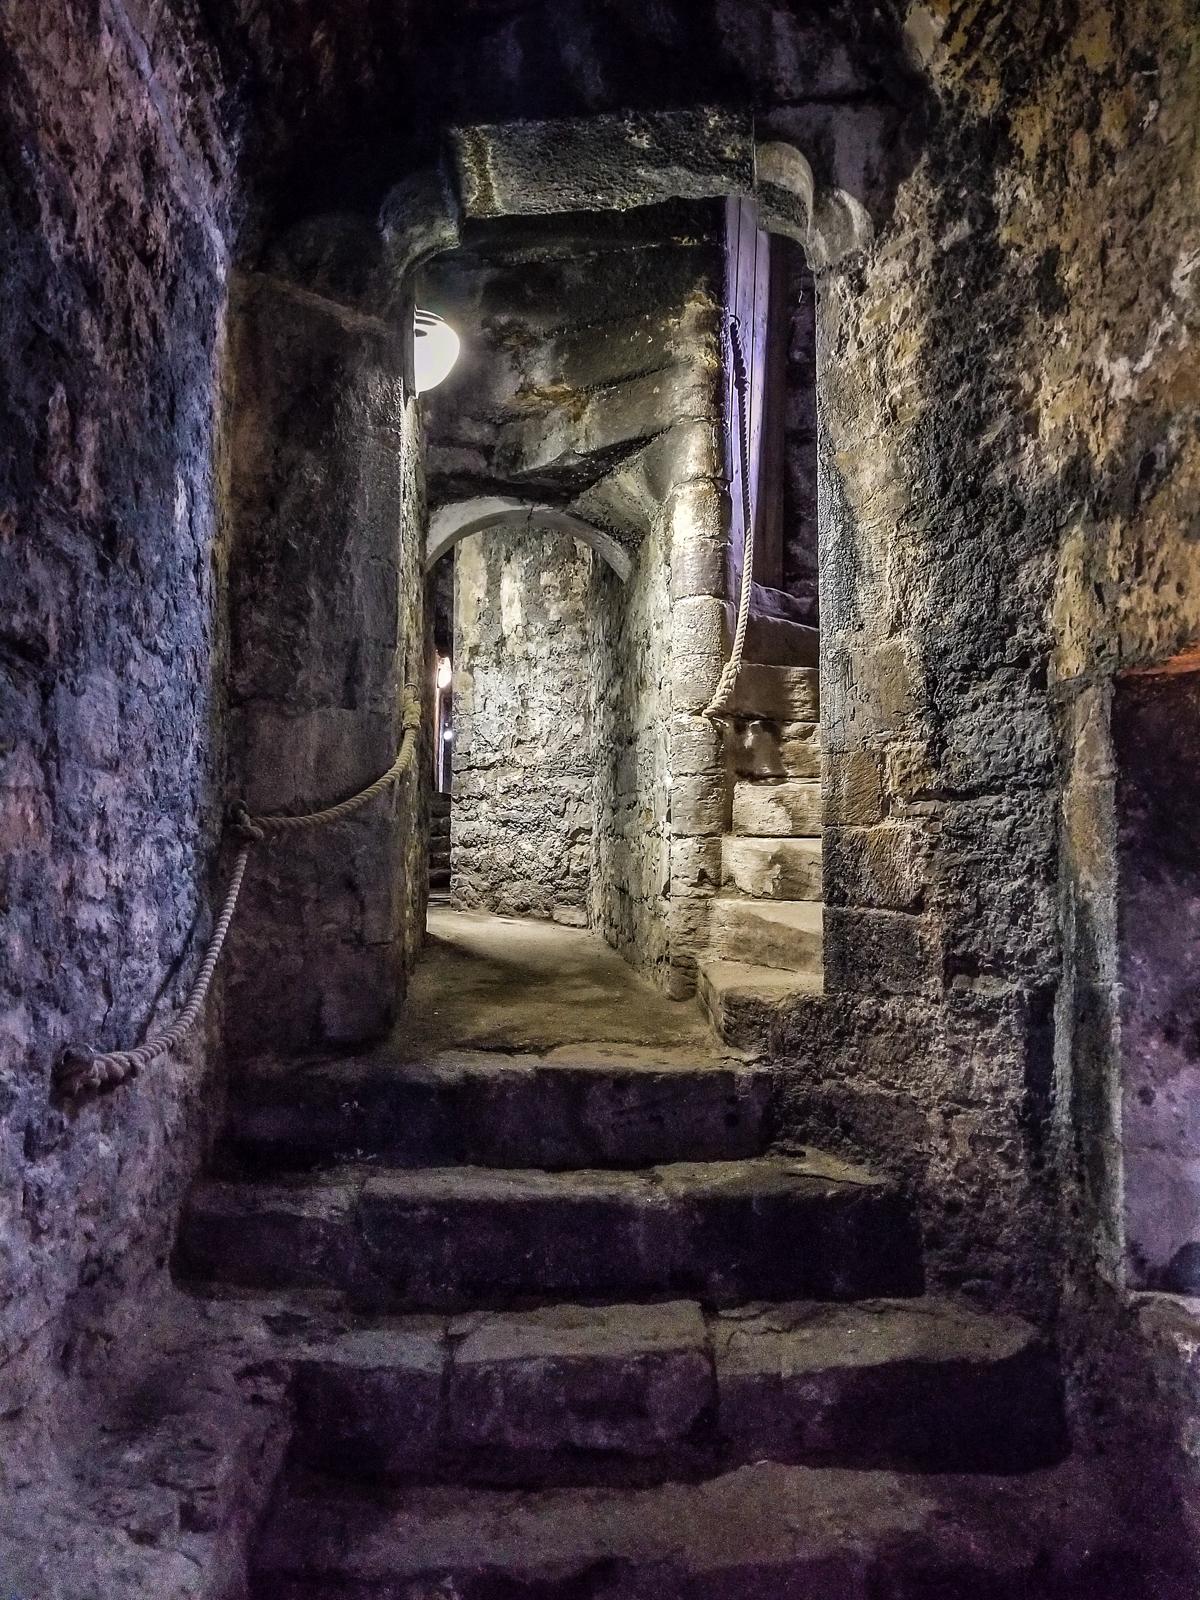 beaumaris castle twisting passages ©jennifer bailey 2018 (samsung galaxy s8)